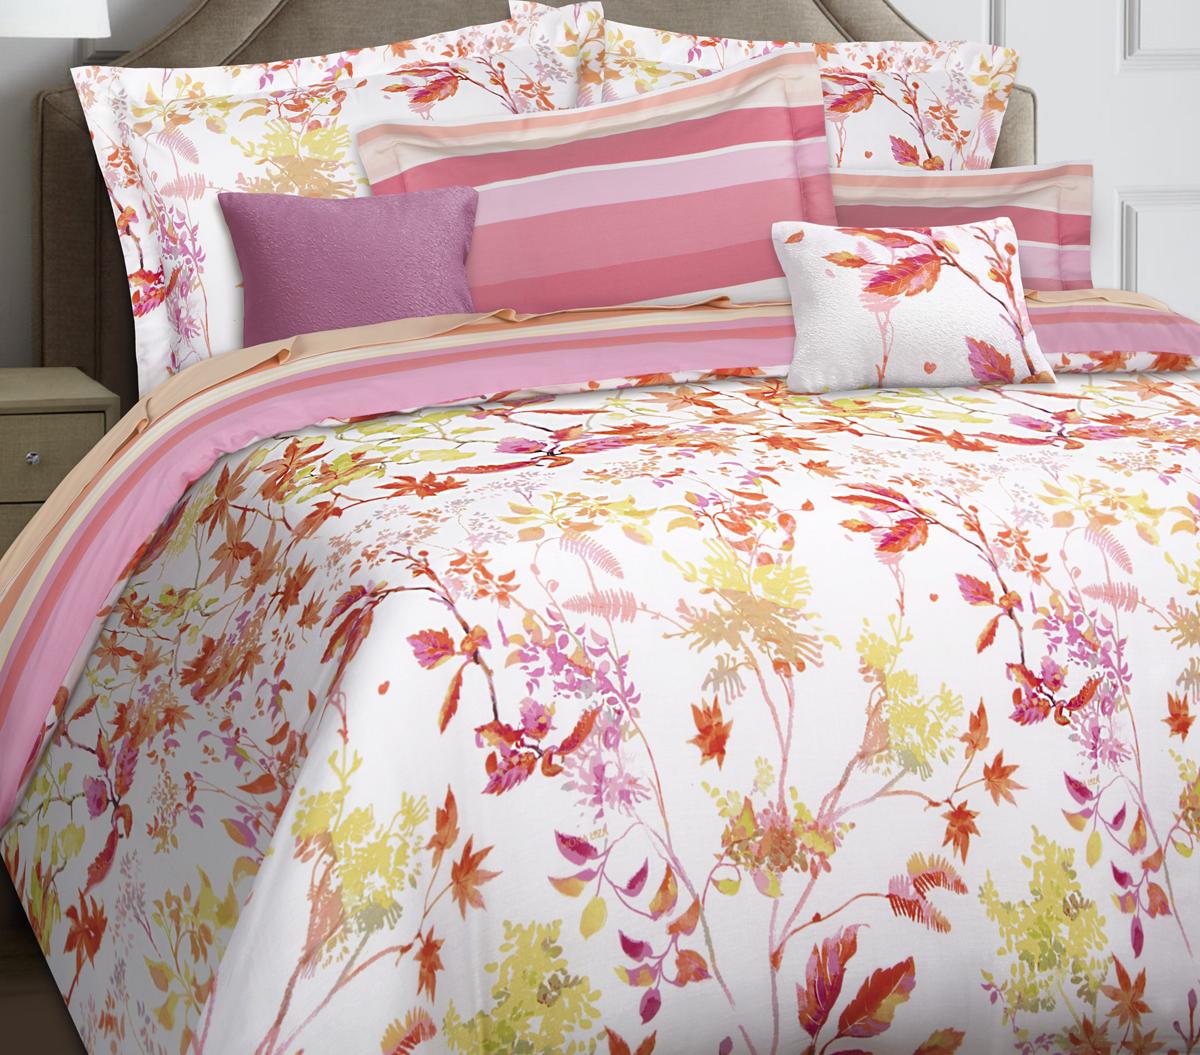 Комплект белья Mona Liza Premium Atelier 4 Seasons, евро, наволочки 50х70, 70х70. 5049-001 комплект постельного белья mona liza royal роза 5439 04 евро наволочки 70х70 50х70